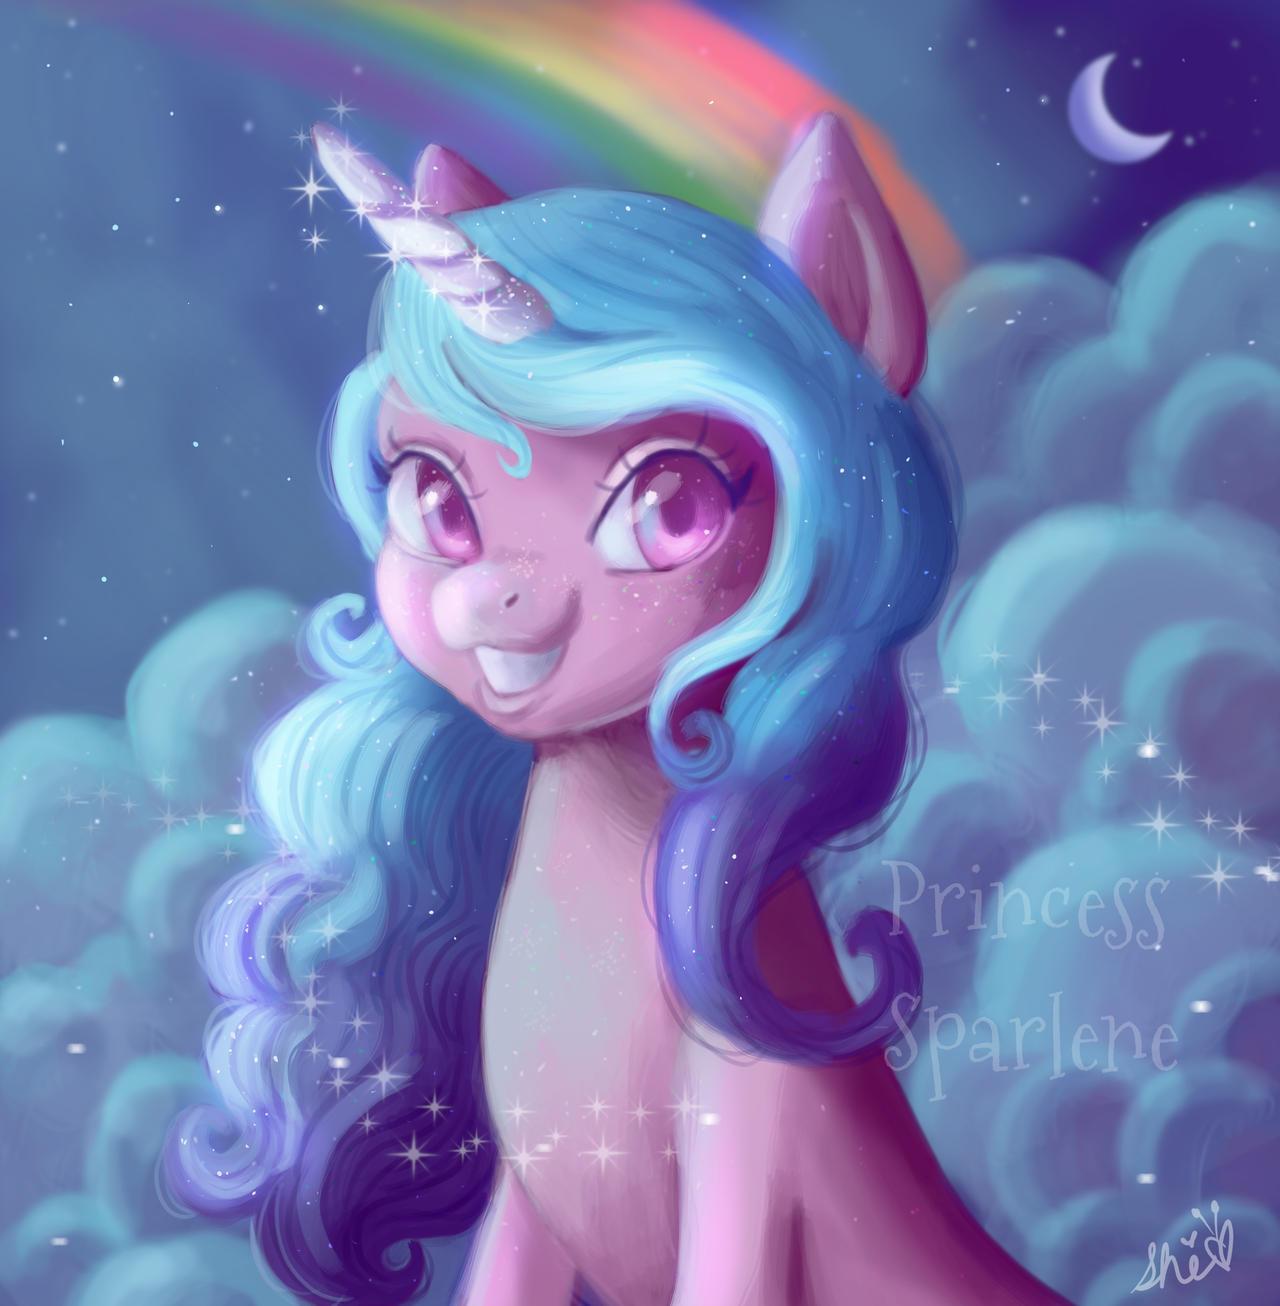 izzy_moonbow_by_princesssparlene_deohmbc-fullview.jpg